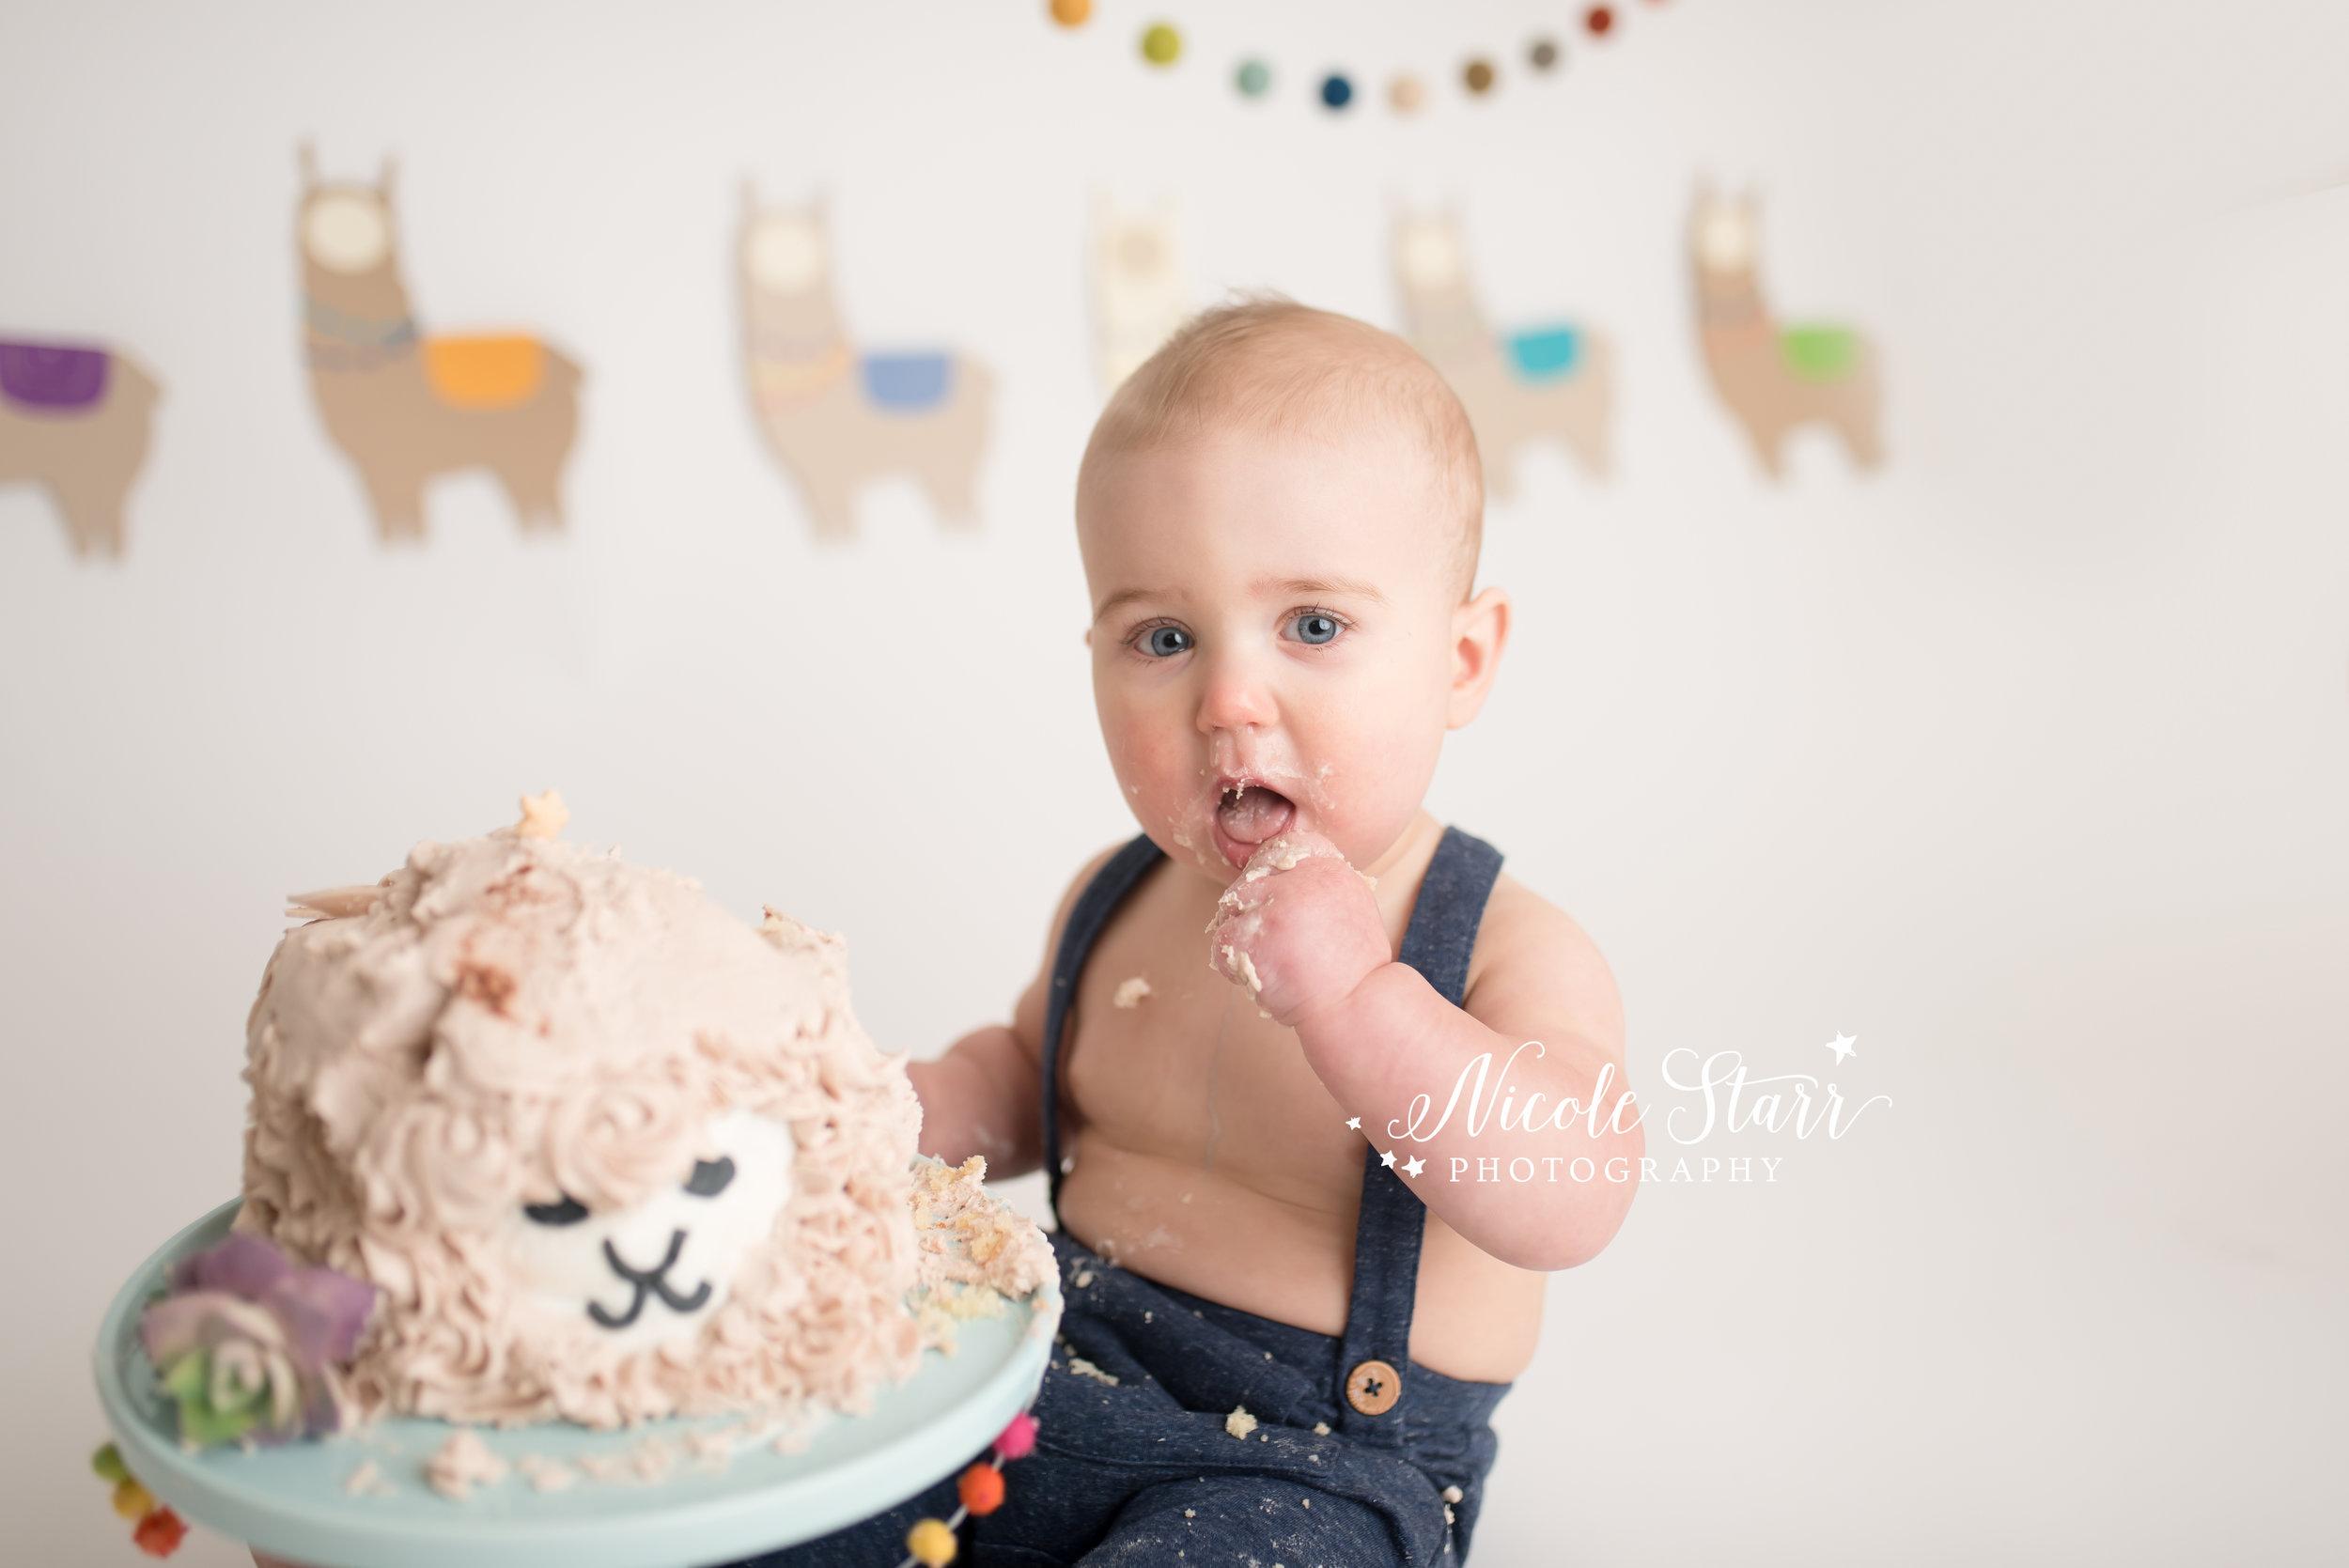 llama cake smash, nicole starr photography, saratoga springs cake smash photographer-9.jpg